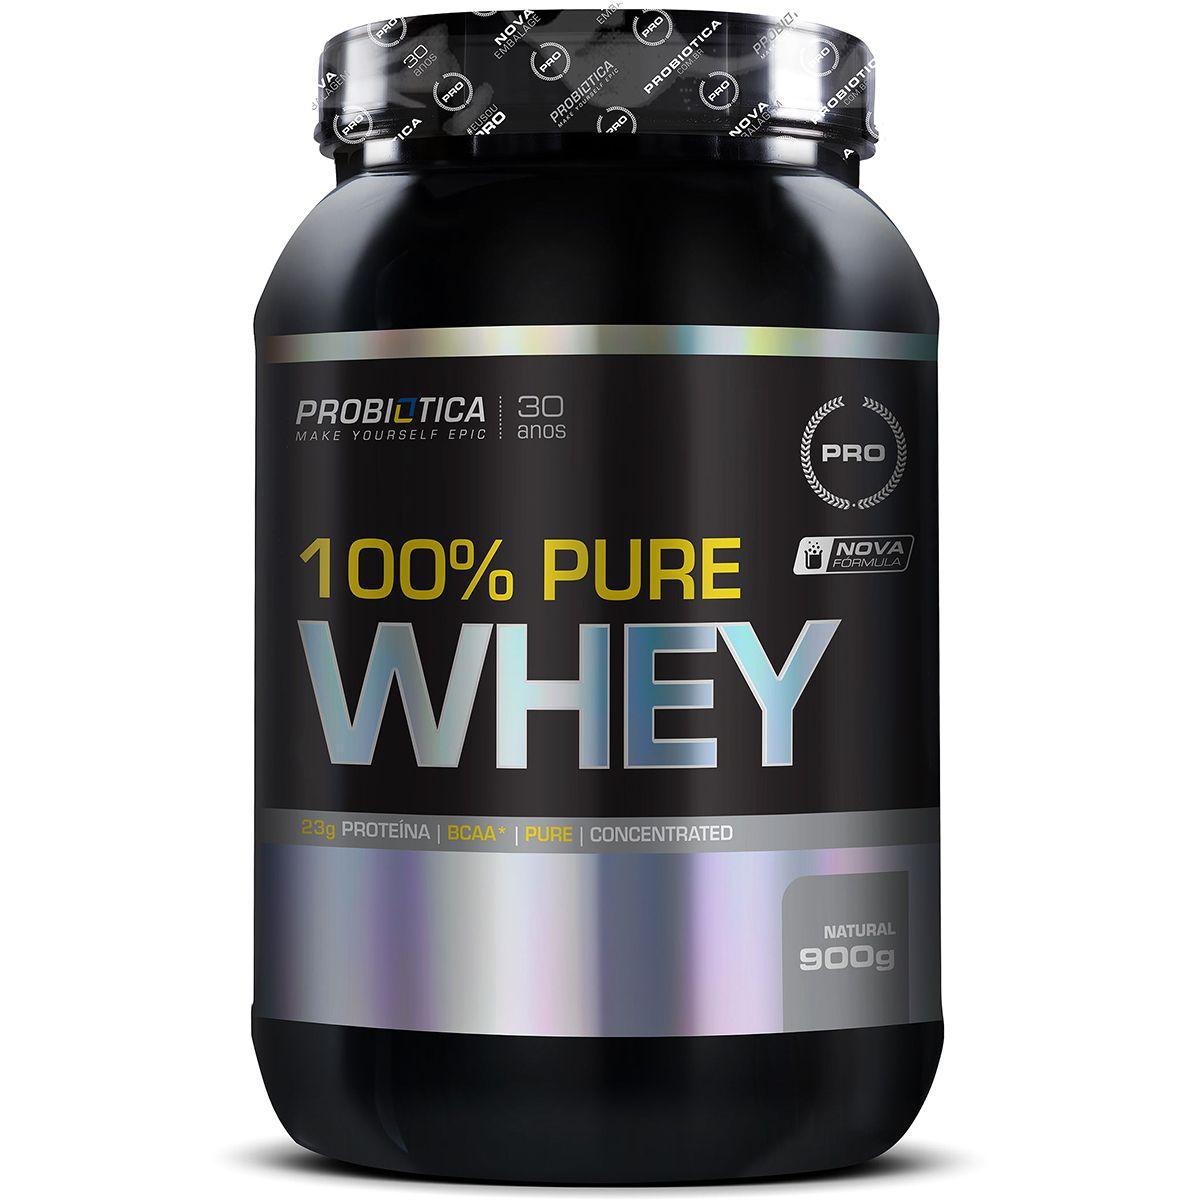 100% Pure Whey 900g - Morango - Probiótica